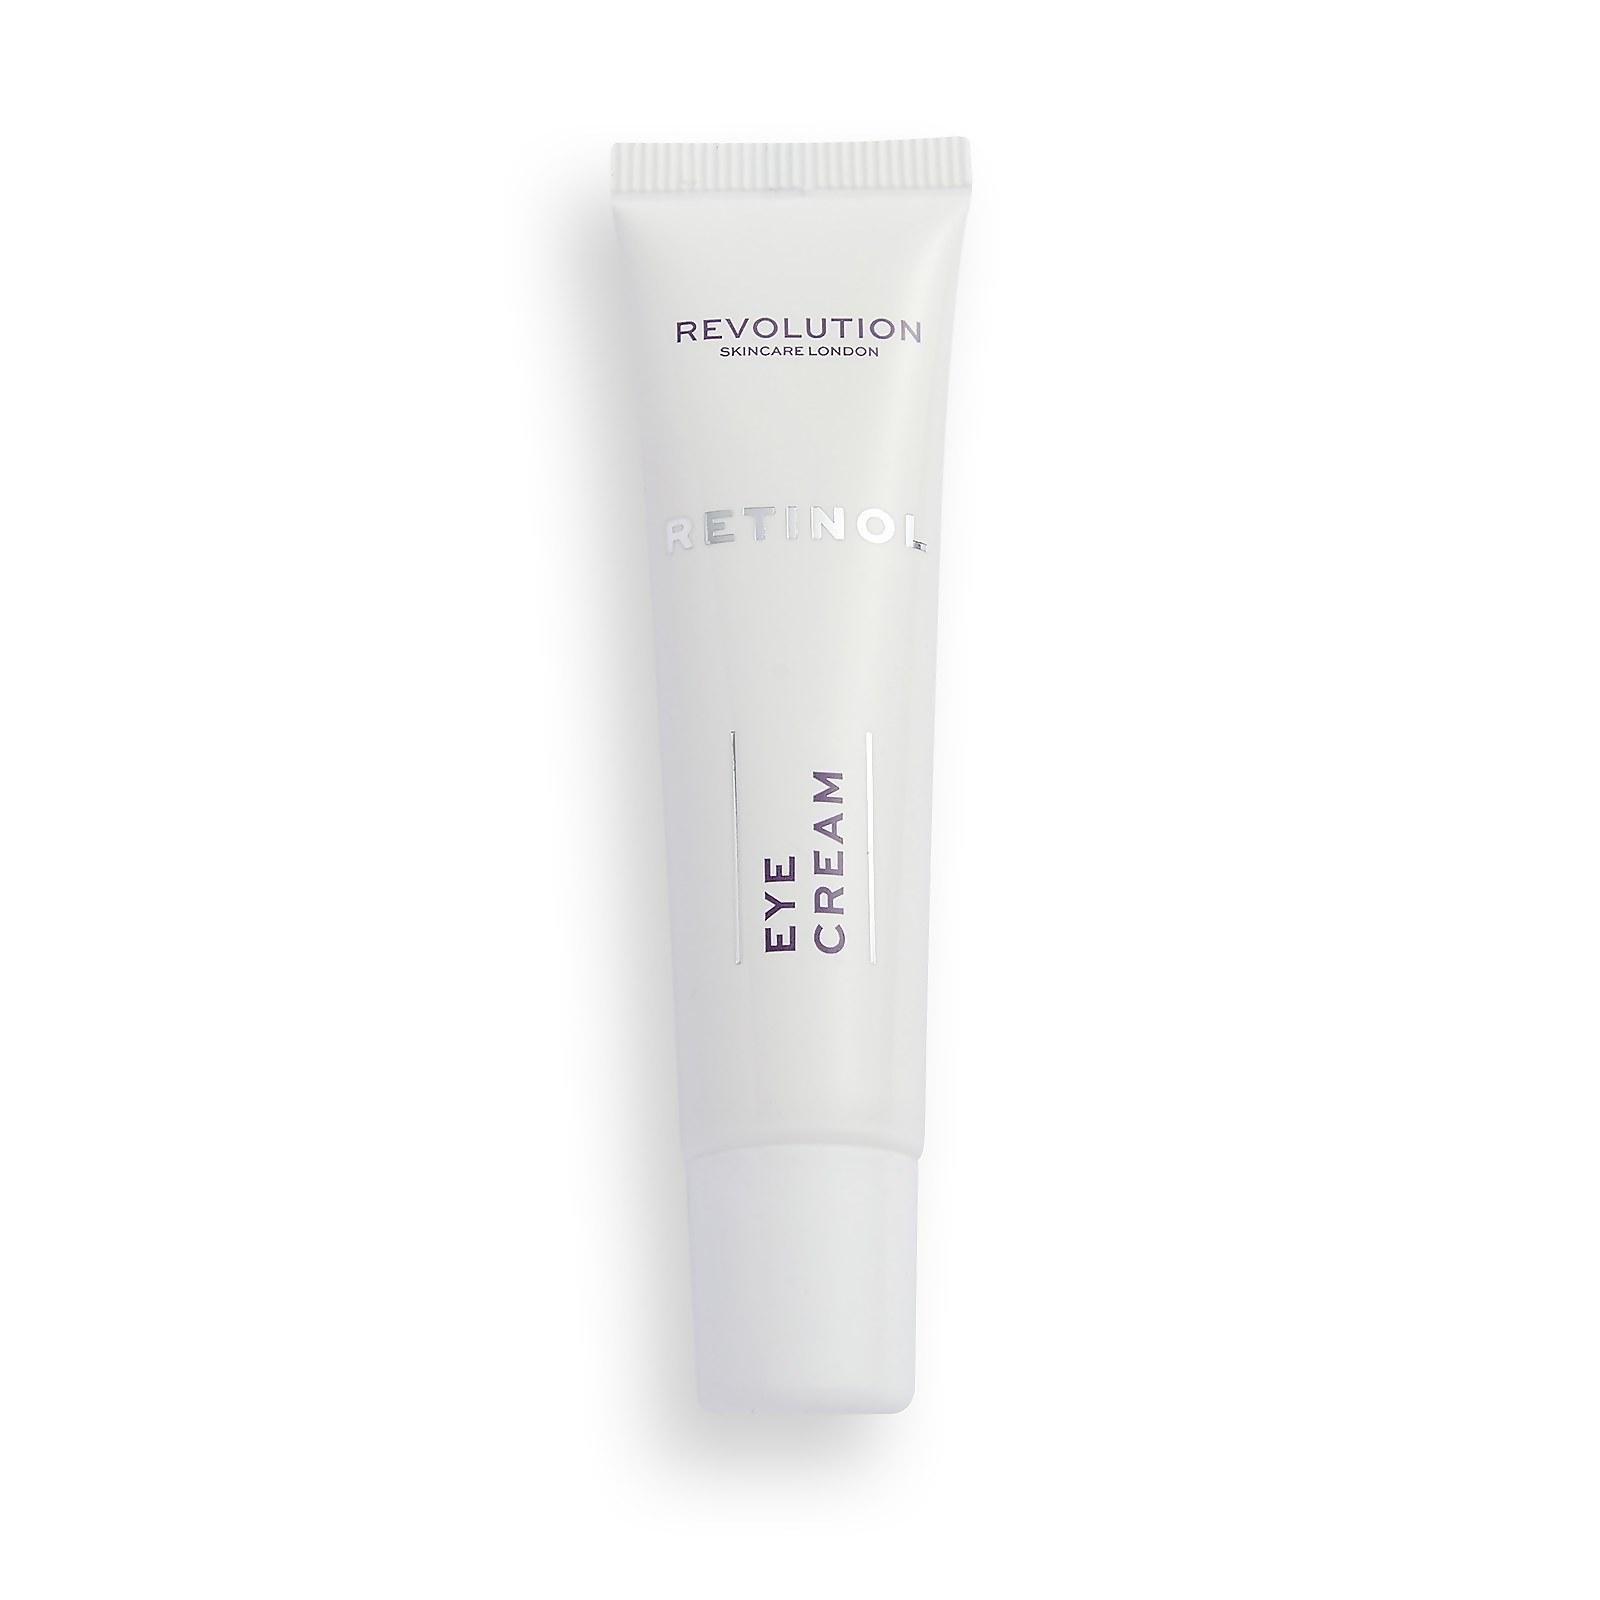 Revolution Skincare Retinol Eye Cream